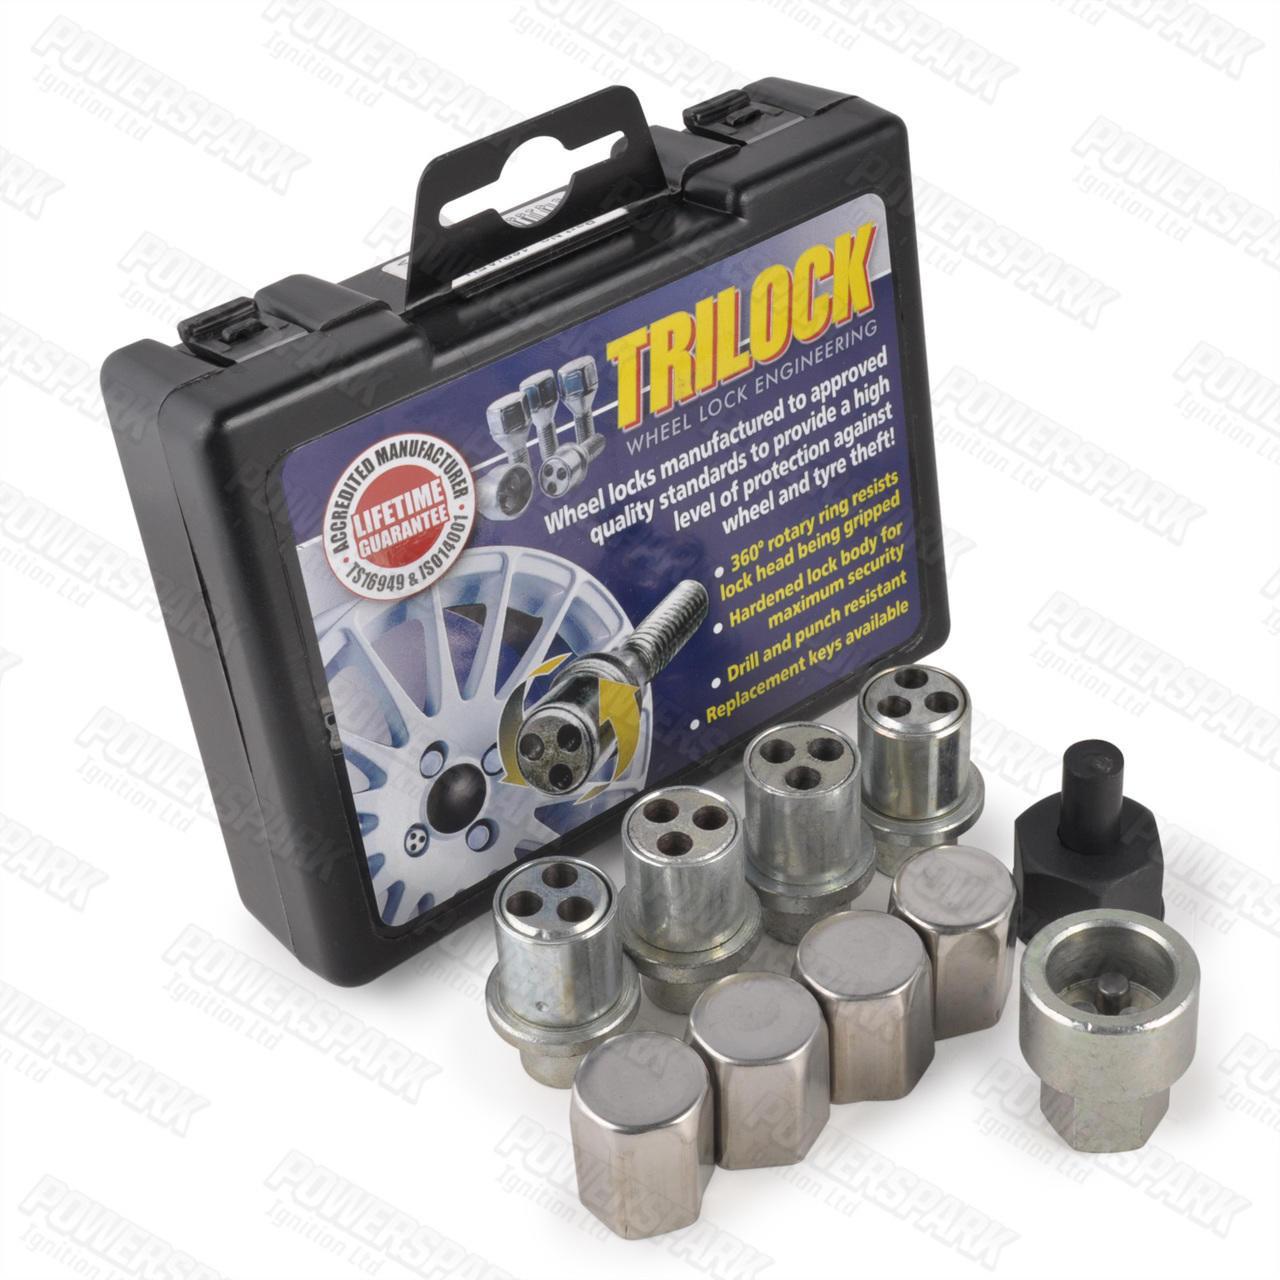 TriLock Trilock Locking Alloy Wheel Nut Set AFH for Classic Austin BL Mini up to 1988